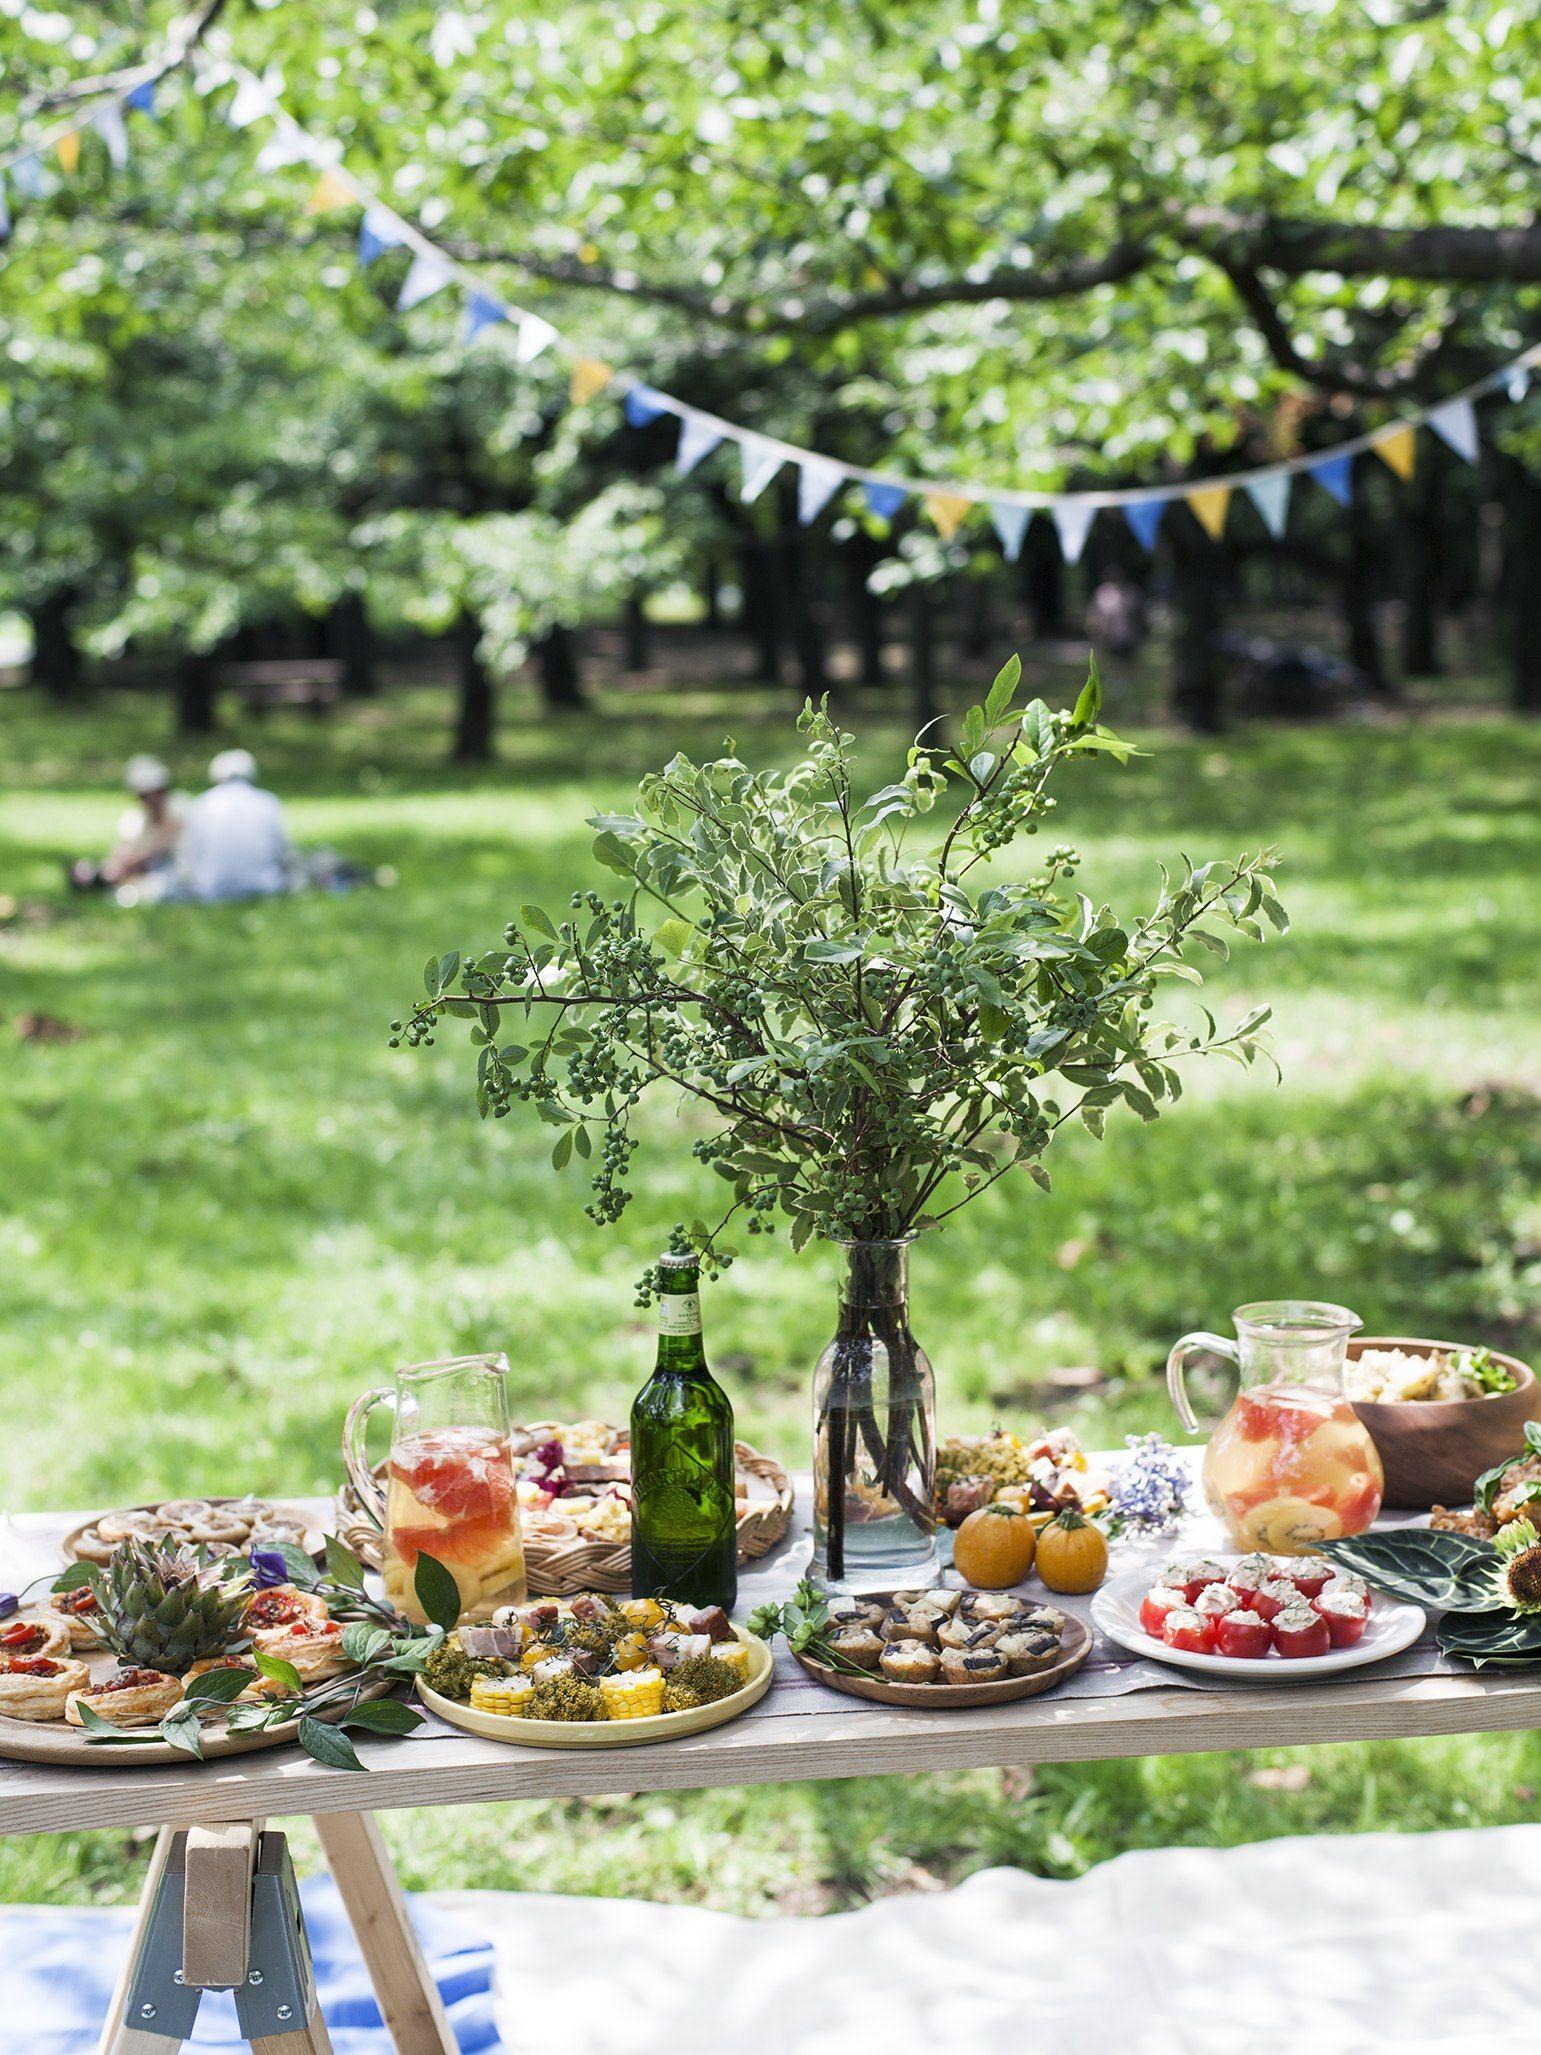 yoyogi park picnic